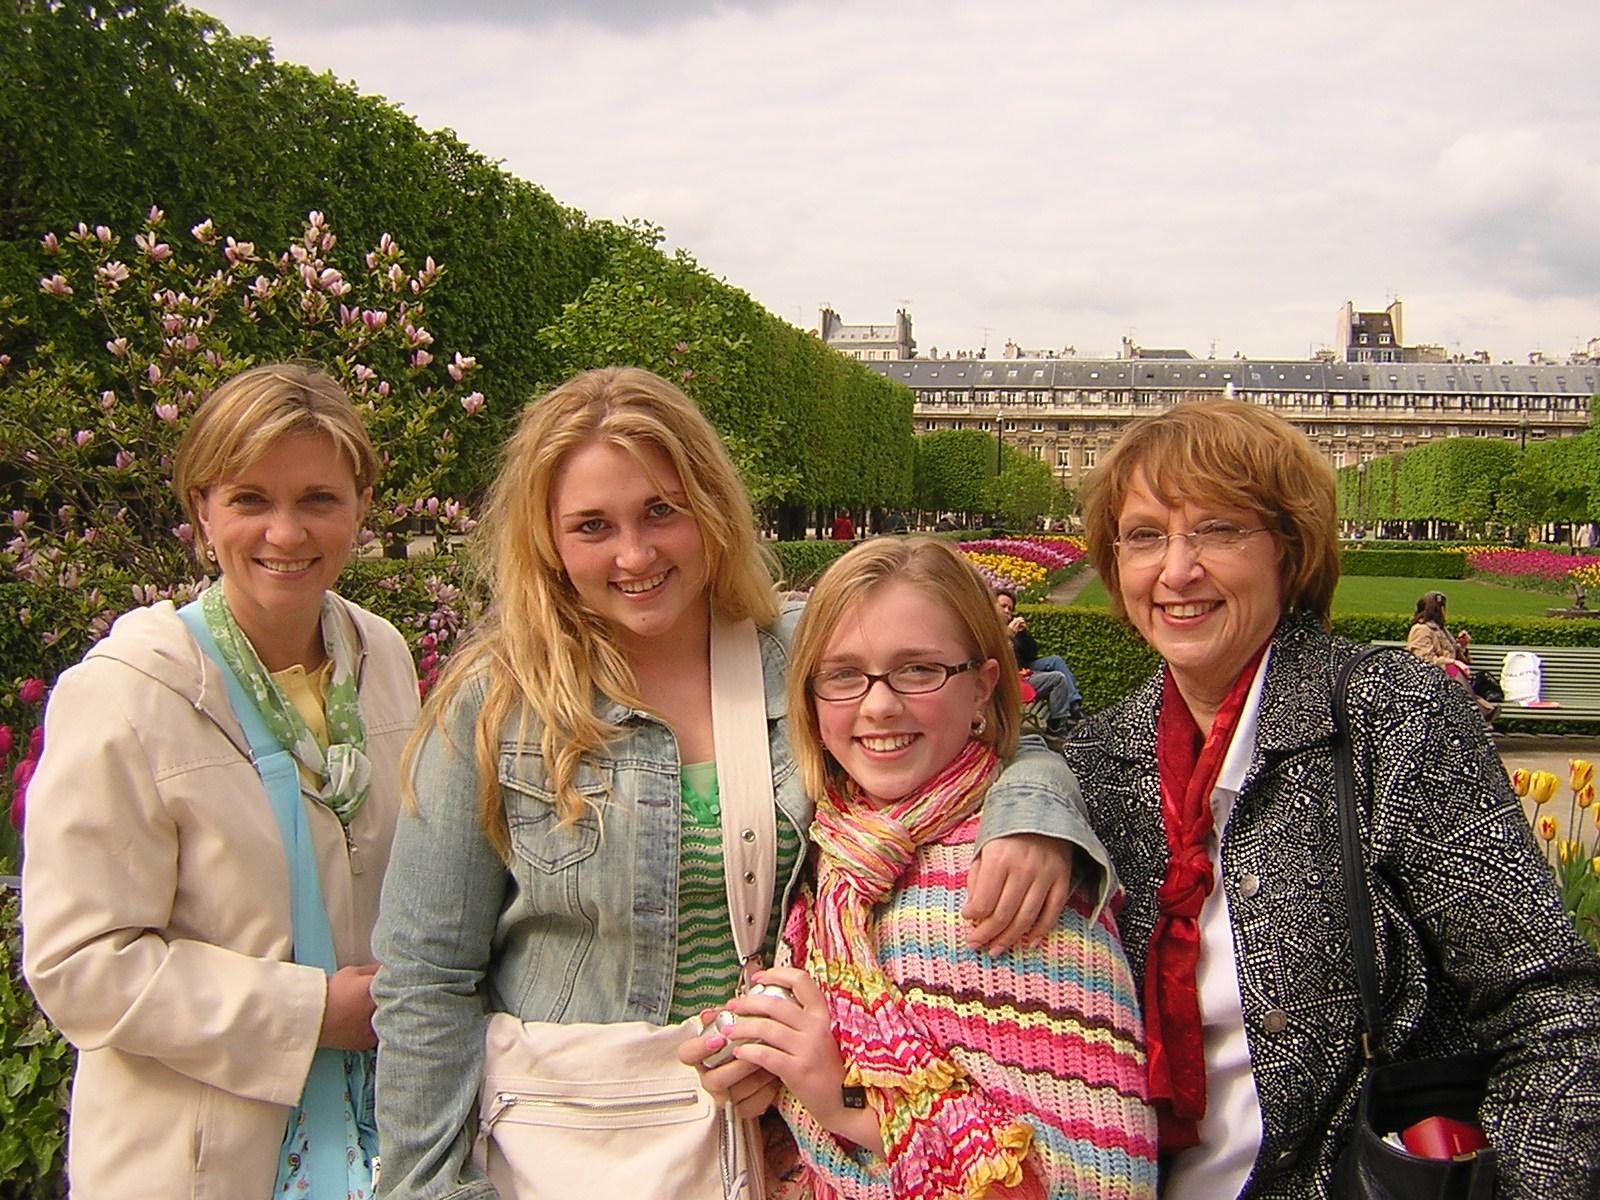 Barbara Bickley and family 20 April 05 b.jpg